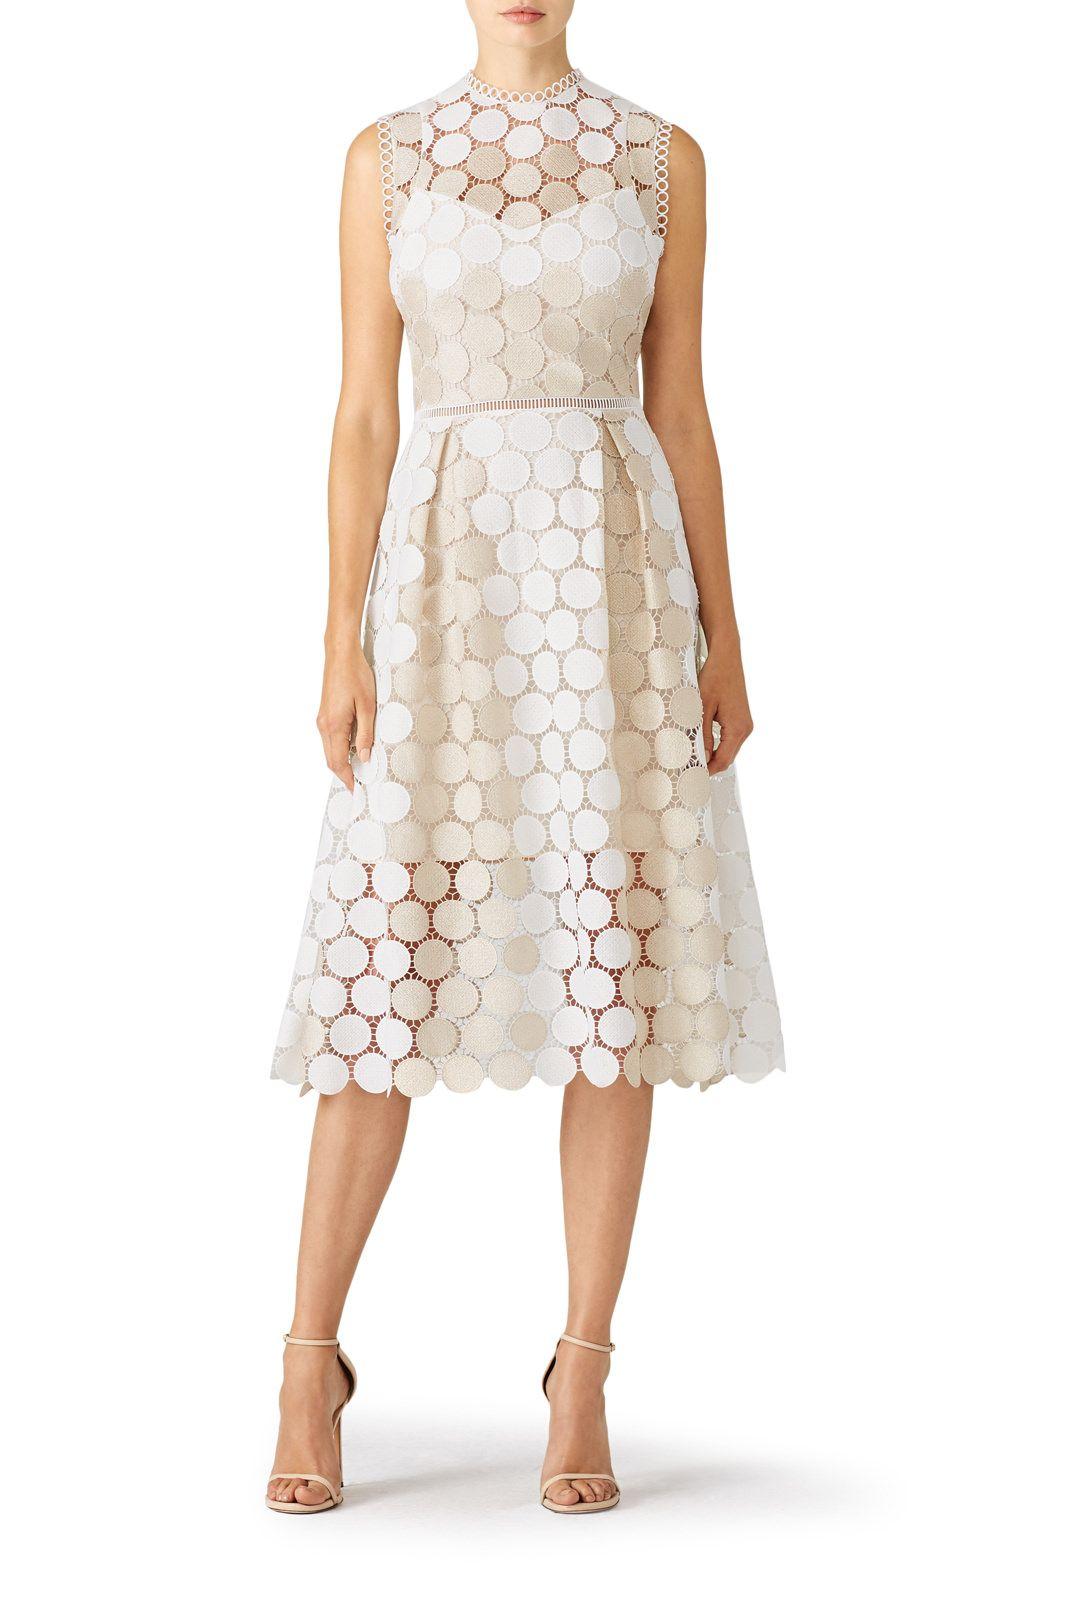 Shoshanna Glengarry Dress Dresses Red Carpet Dresses Rent Dresses